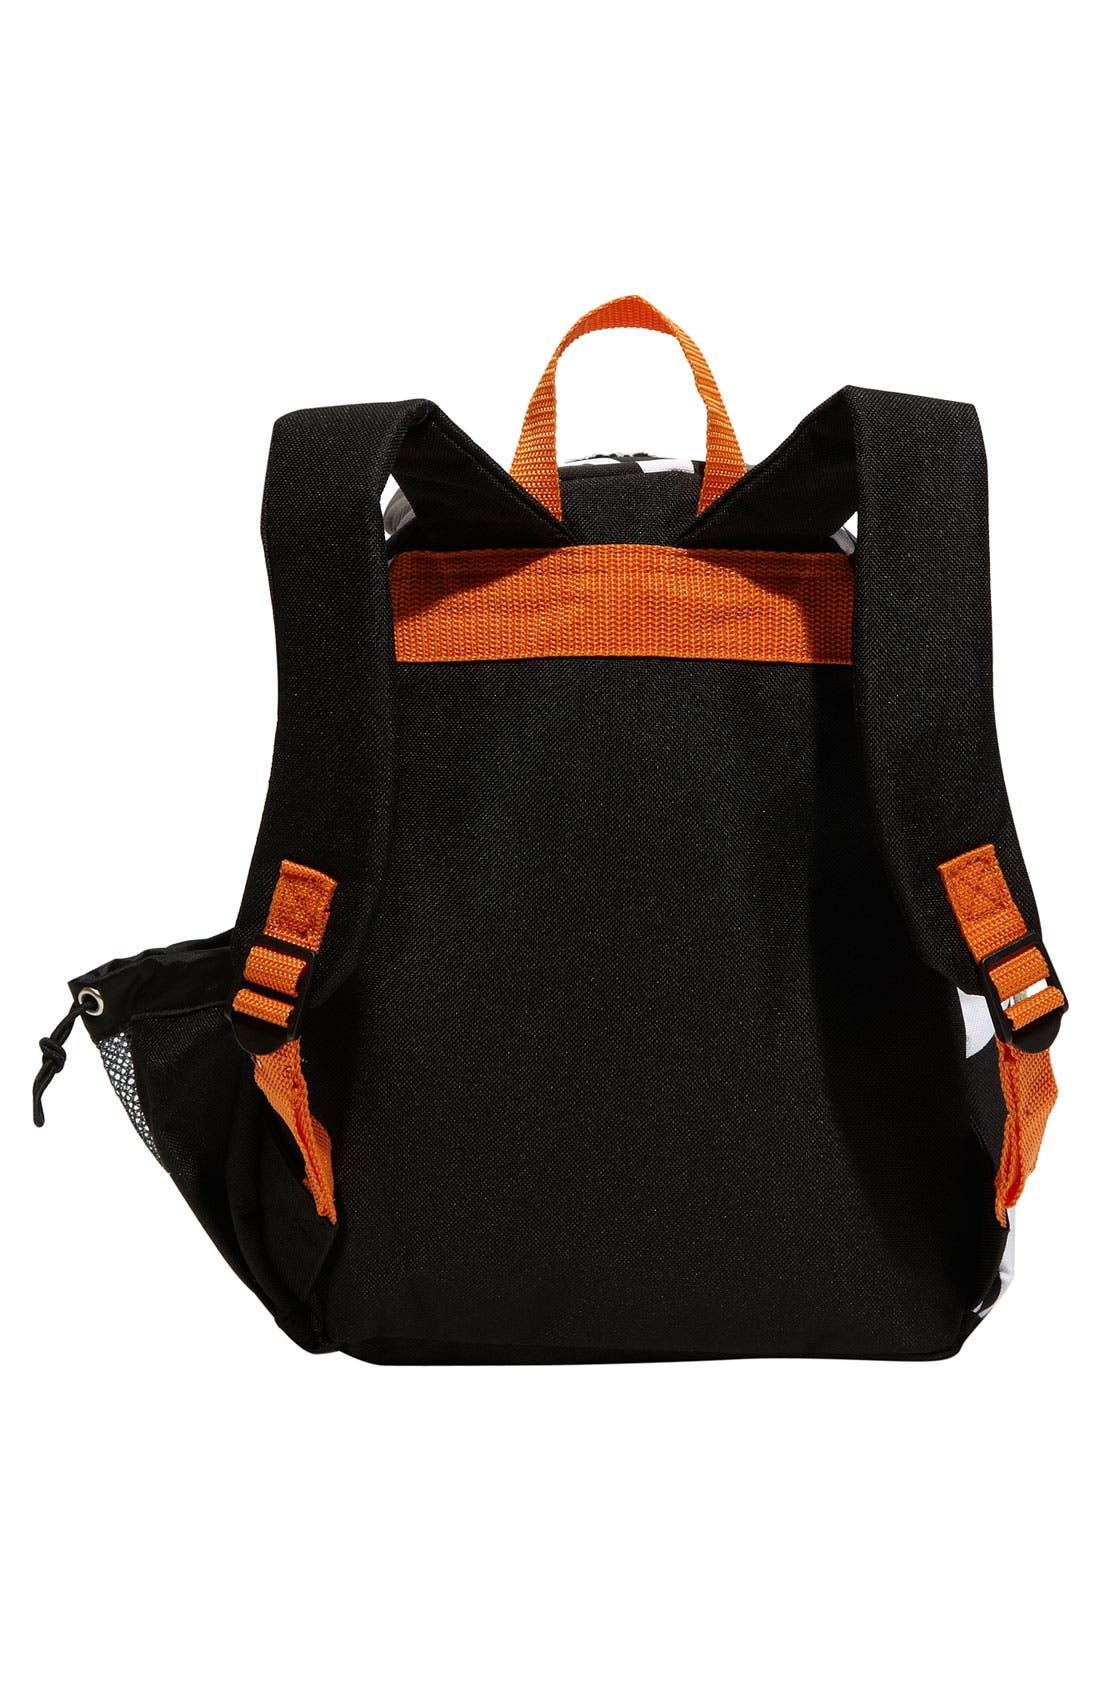 Zoo Pack Backpack,                             Alternate thumbnail 4, color,                             White/ Black